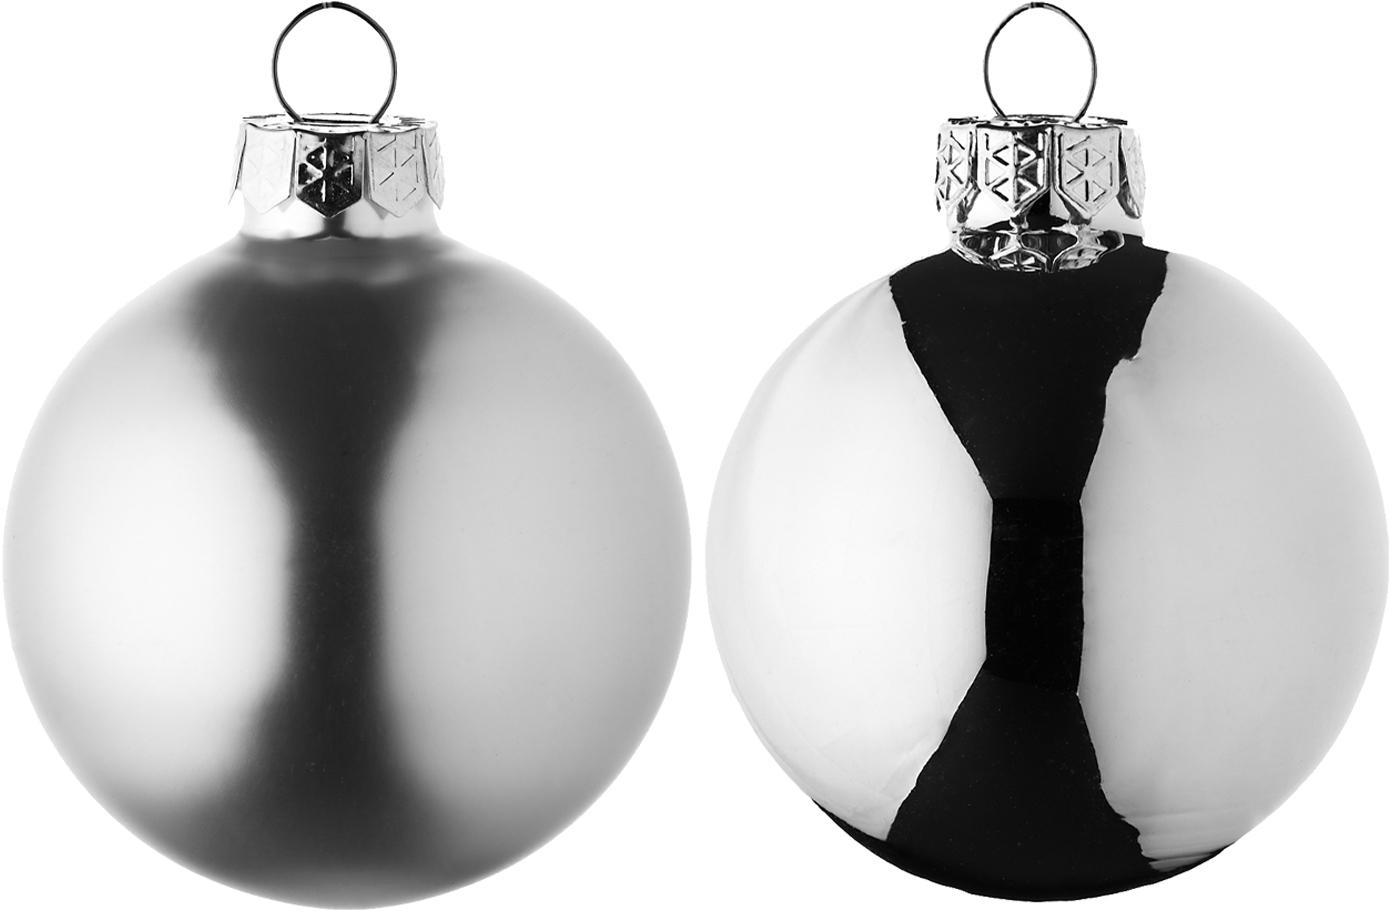 Weihnachtskugel-Set Evergreen Ø6cm,10-tlg., Silberfarben, Ø 6 cm